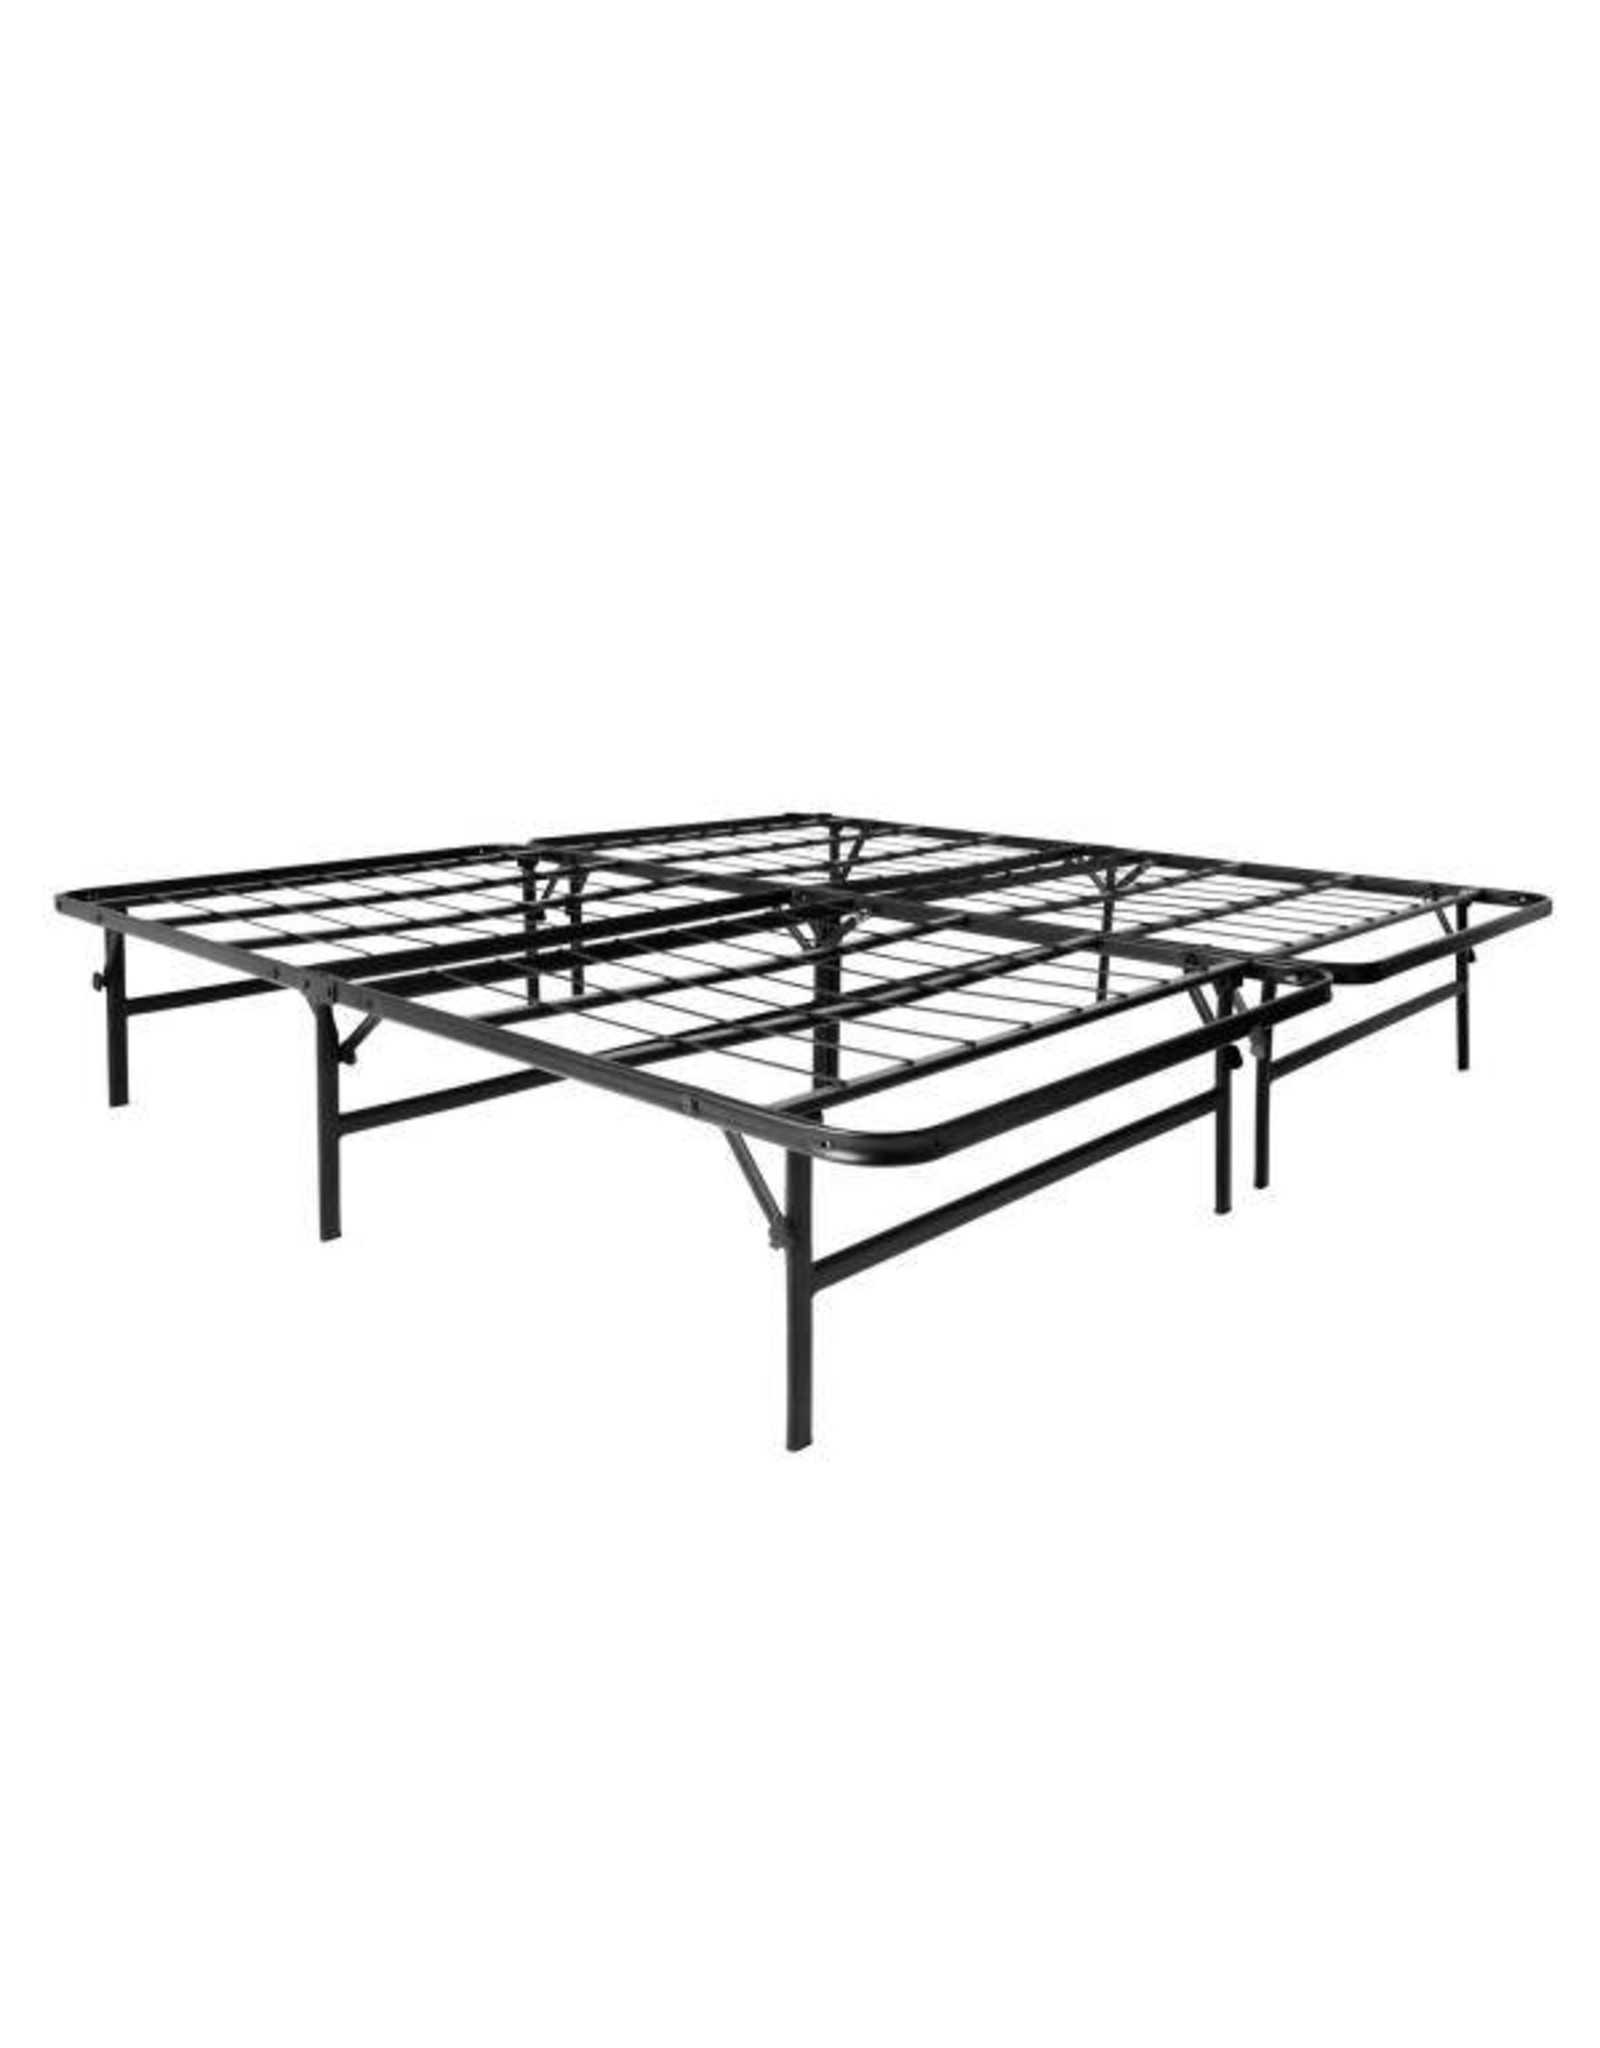 Structures ST22TTFP Bed Frame